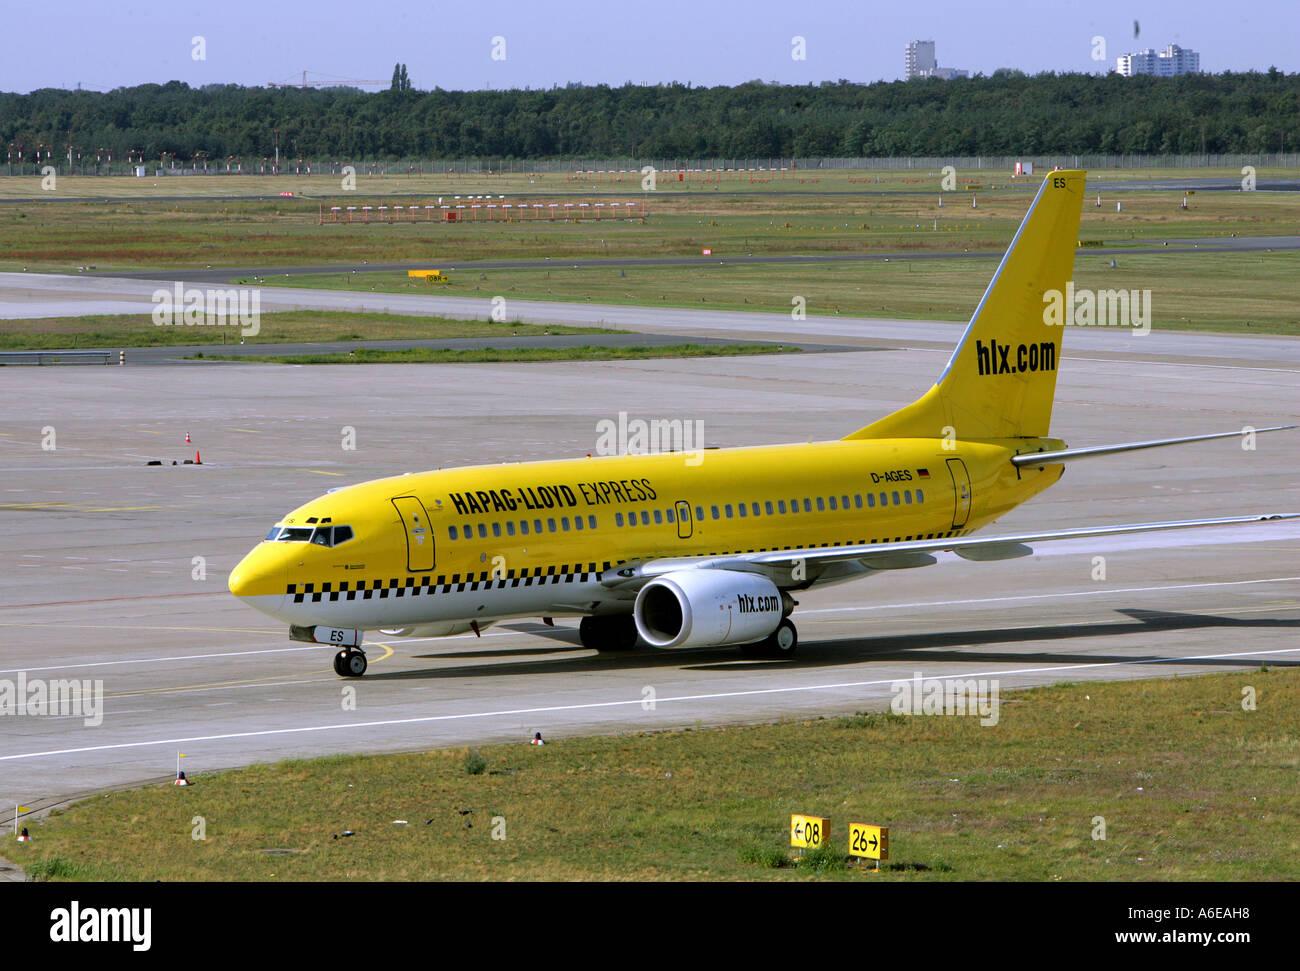 Hapag Lloyd Express airplane at Tegel airport, Berlin - Stock Image